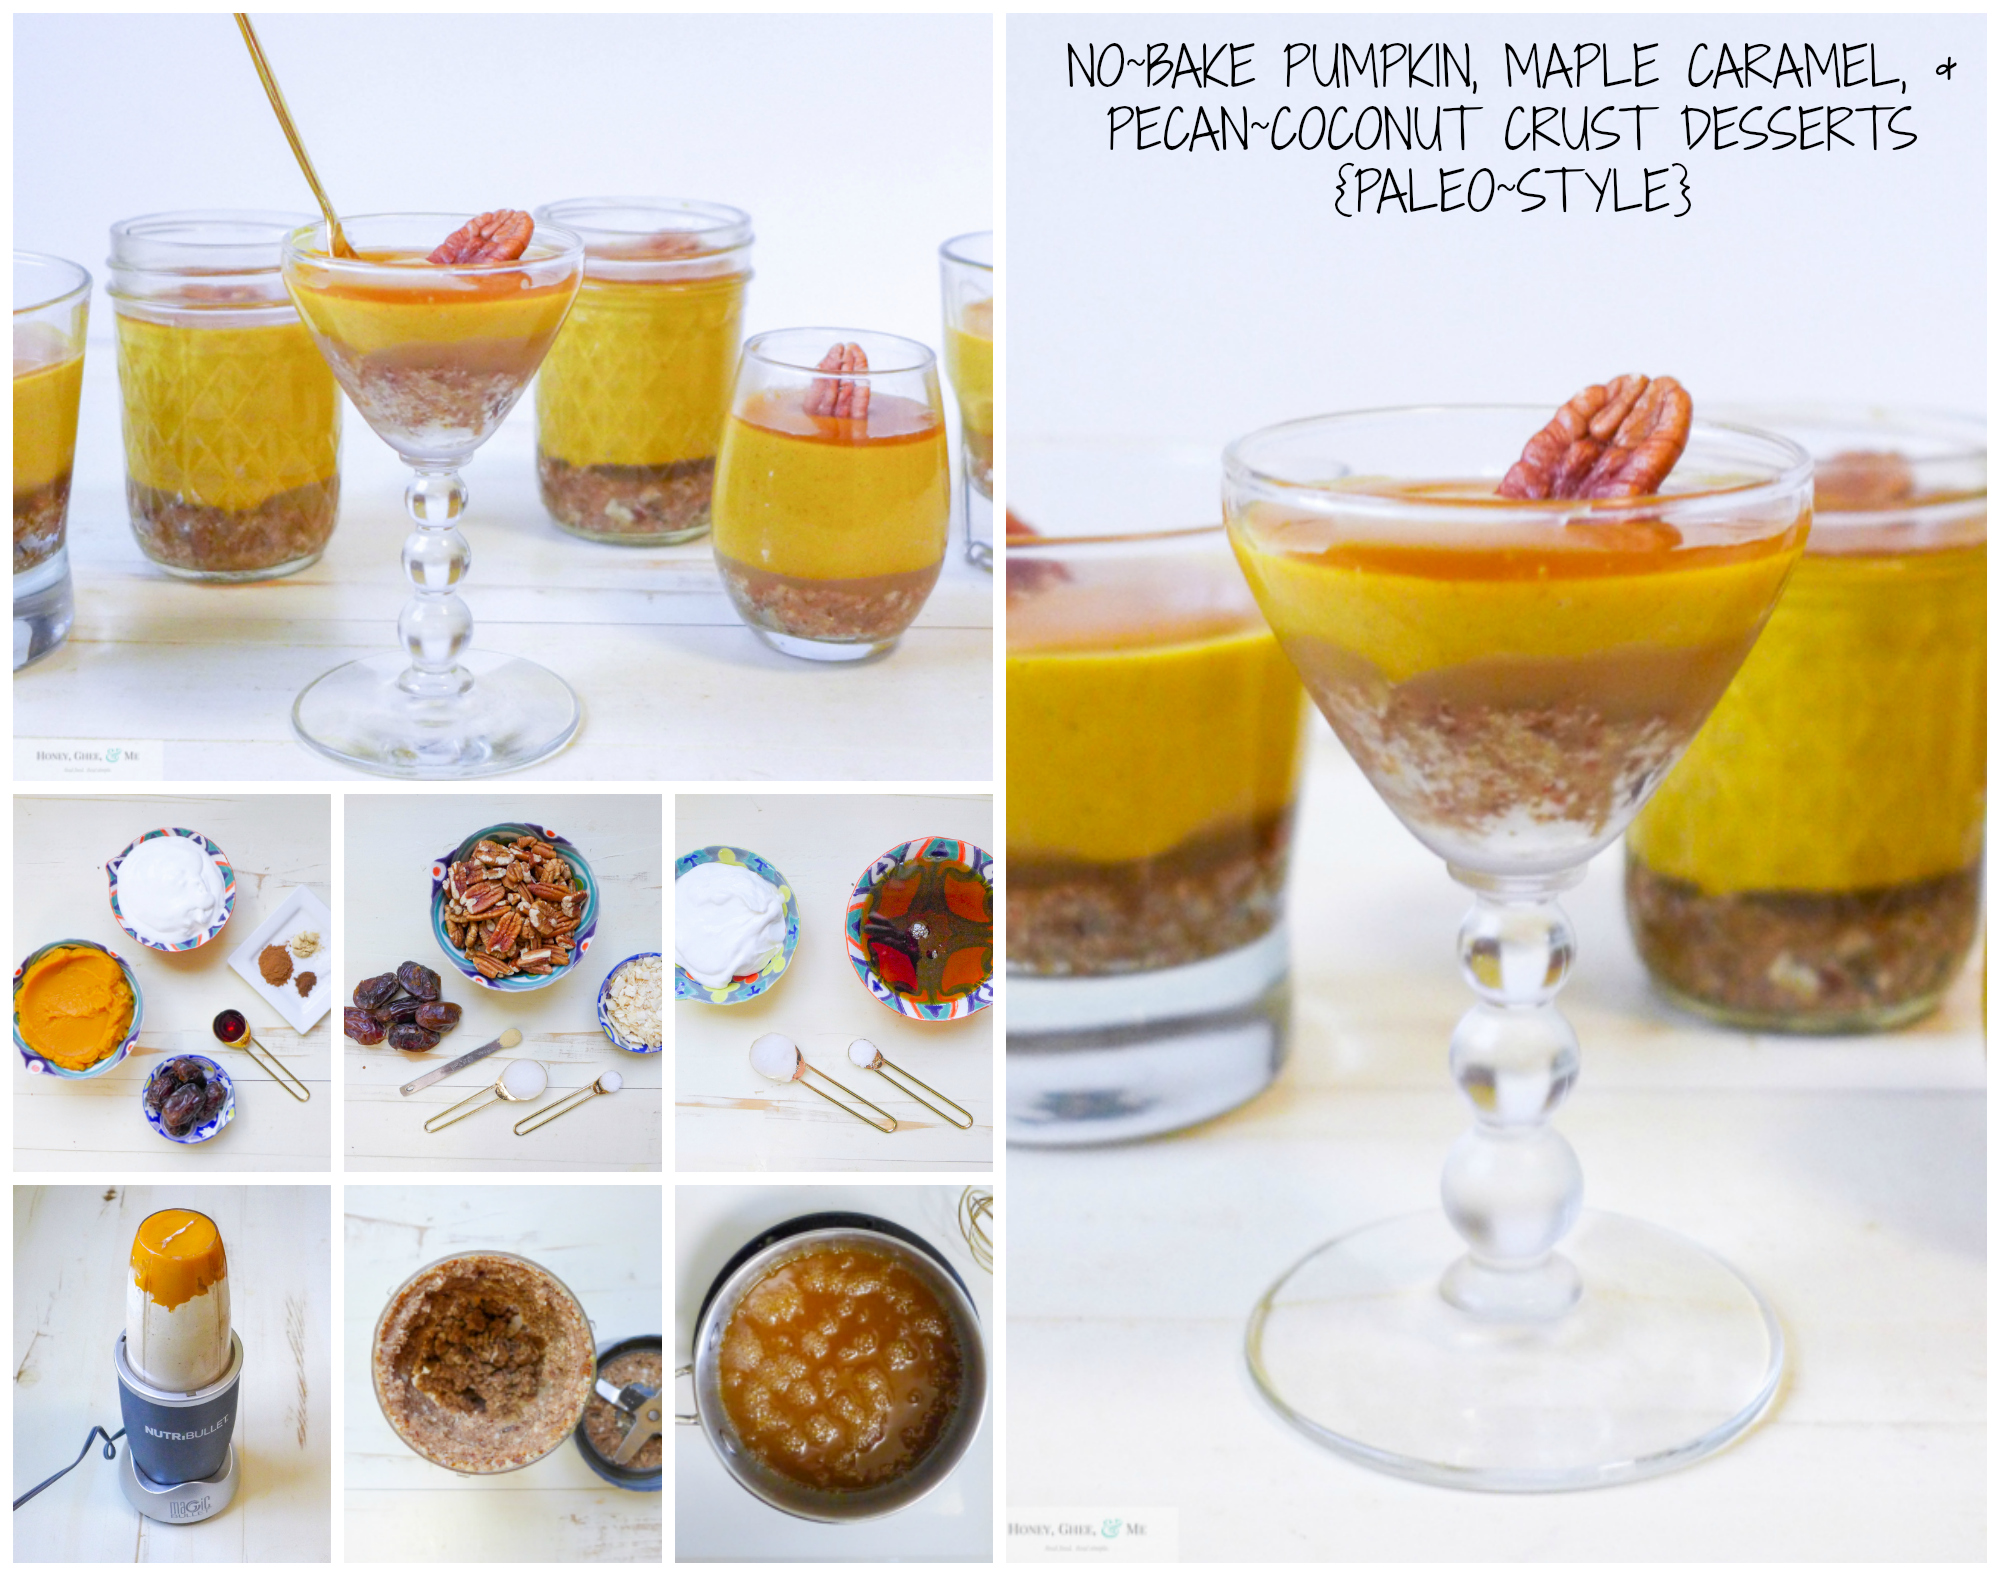 no-bake-pumpkin-maple-caramel-pecan-coconut-crust-desserts-paleo-style